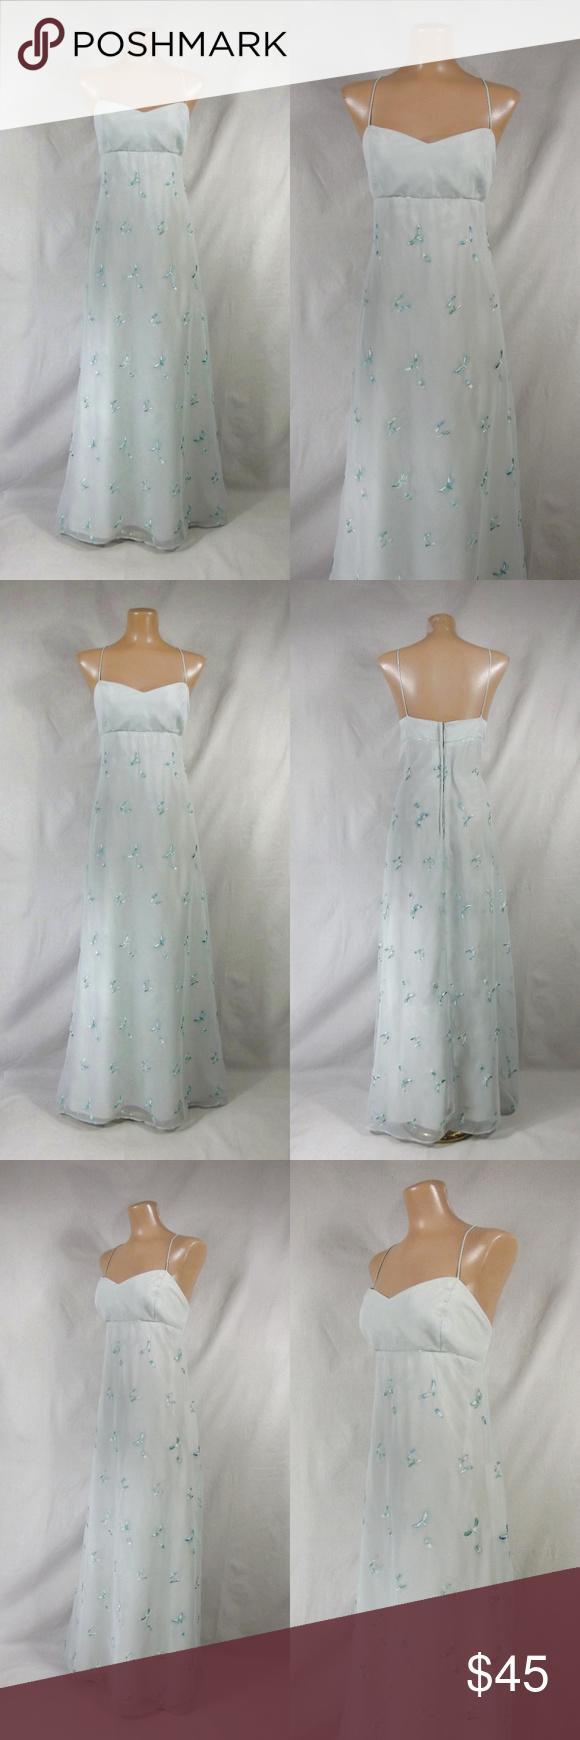 Vintage 90s Embroidered Dragonfly Formal Dress 16 Dresses Dress 16 90s Prom Dress [ 1740 x 580 Pixel ]